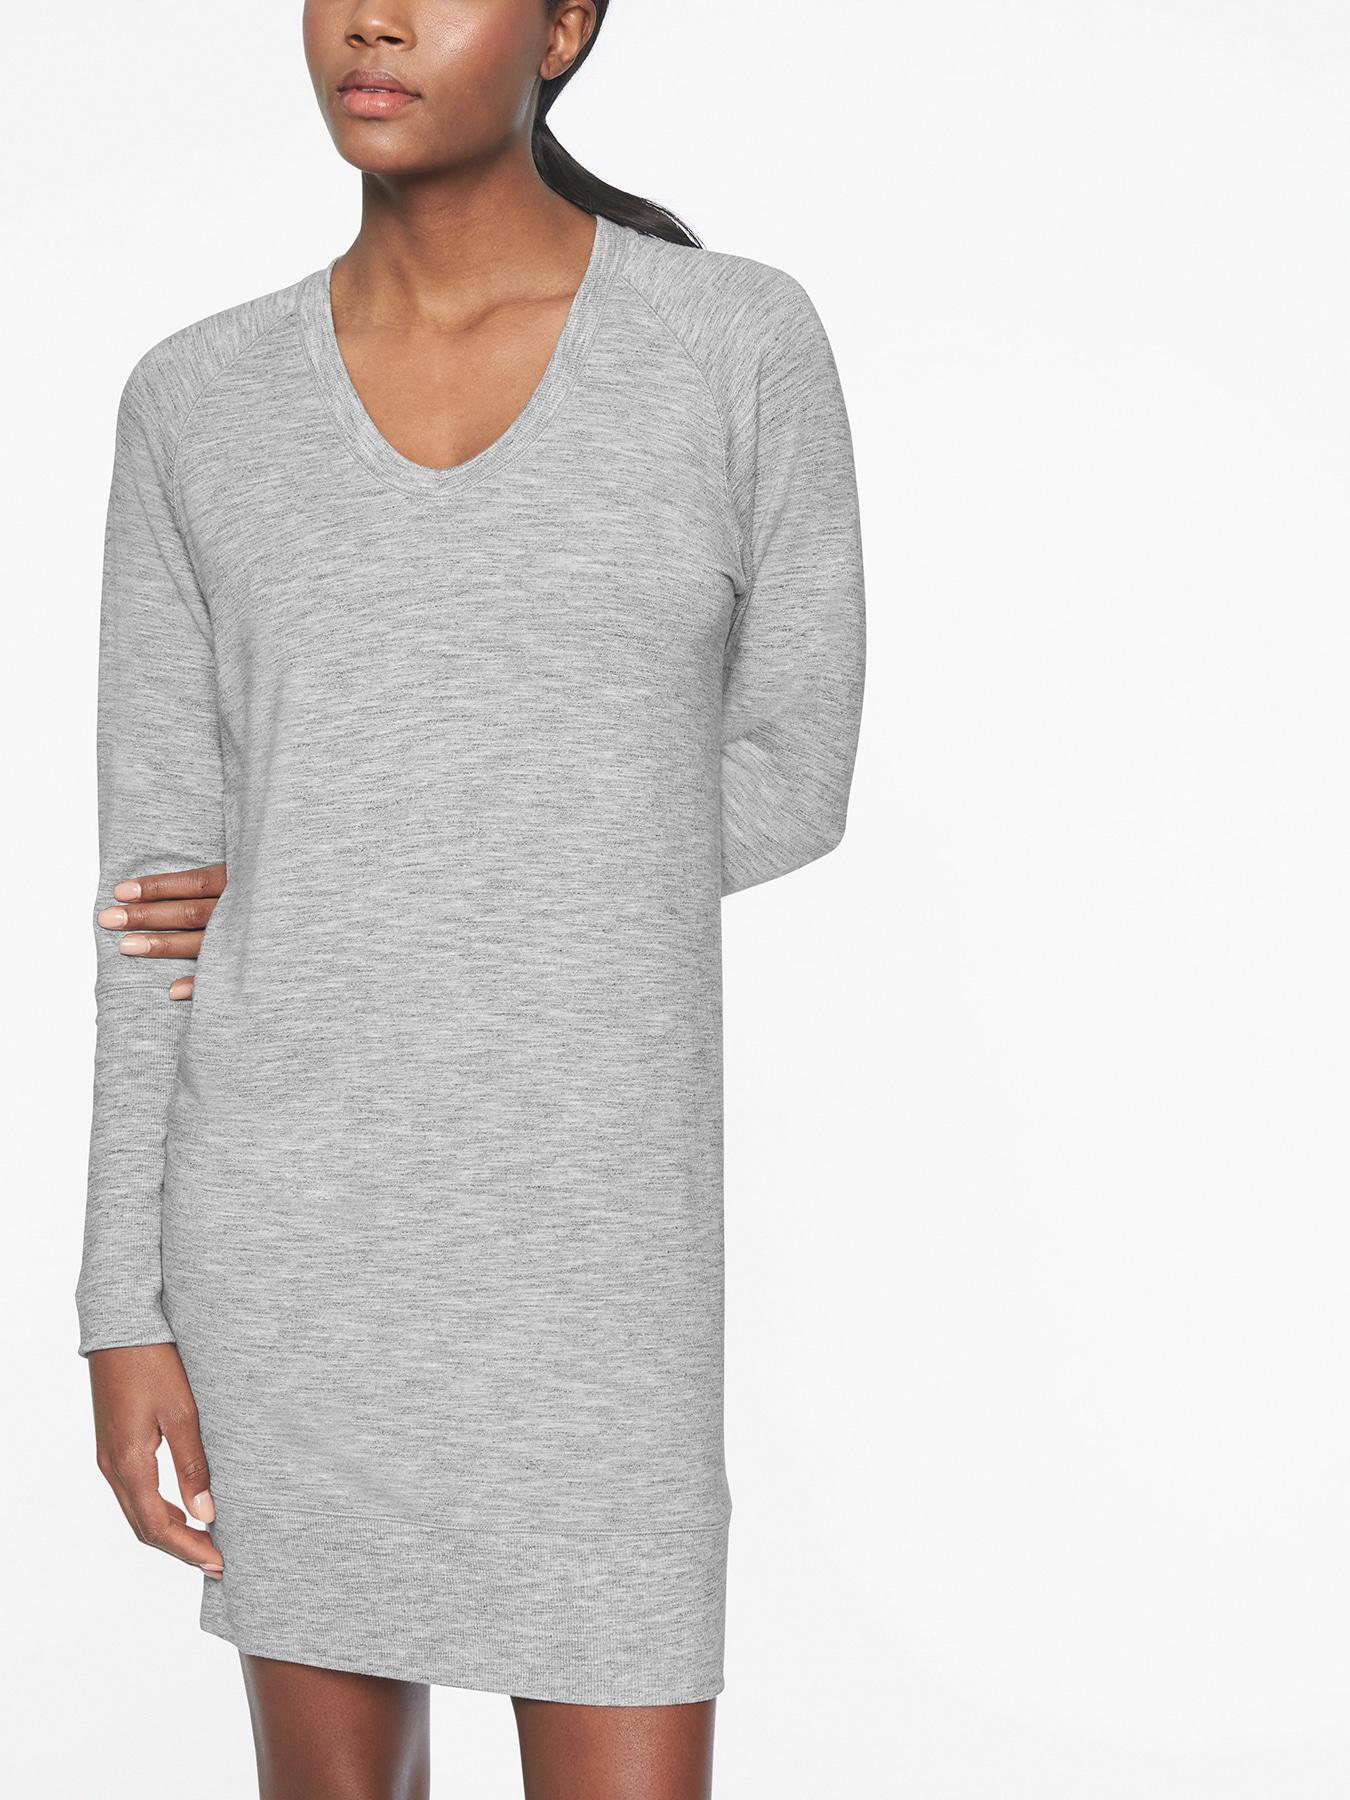 3966ec4193d Lyst - Athleta Nirvana V-neck Sweatshirt Dress in Gray